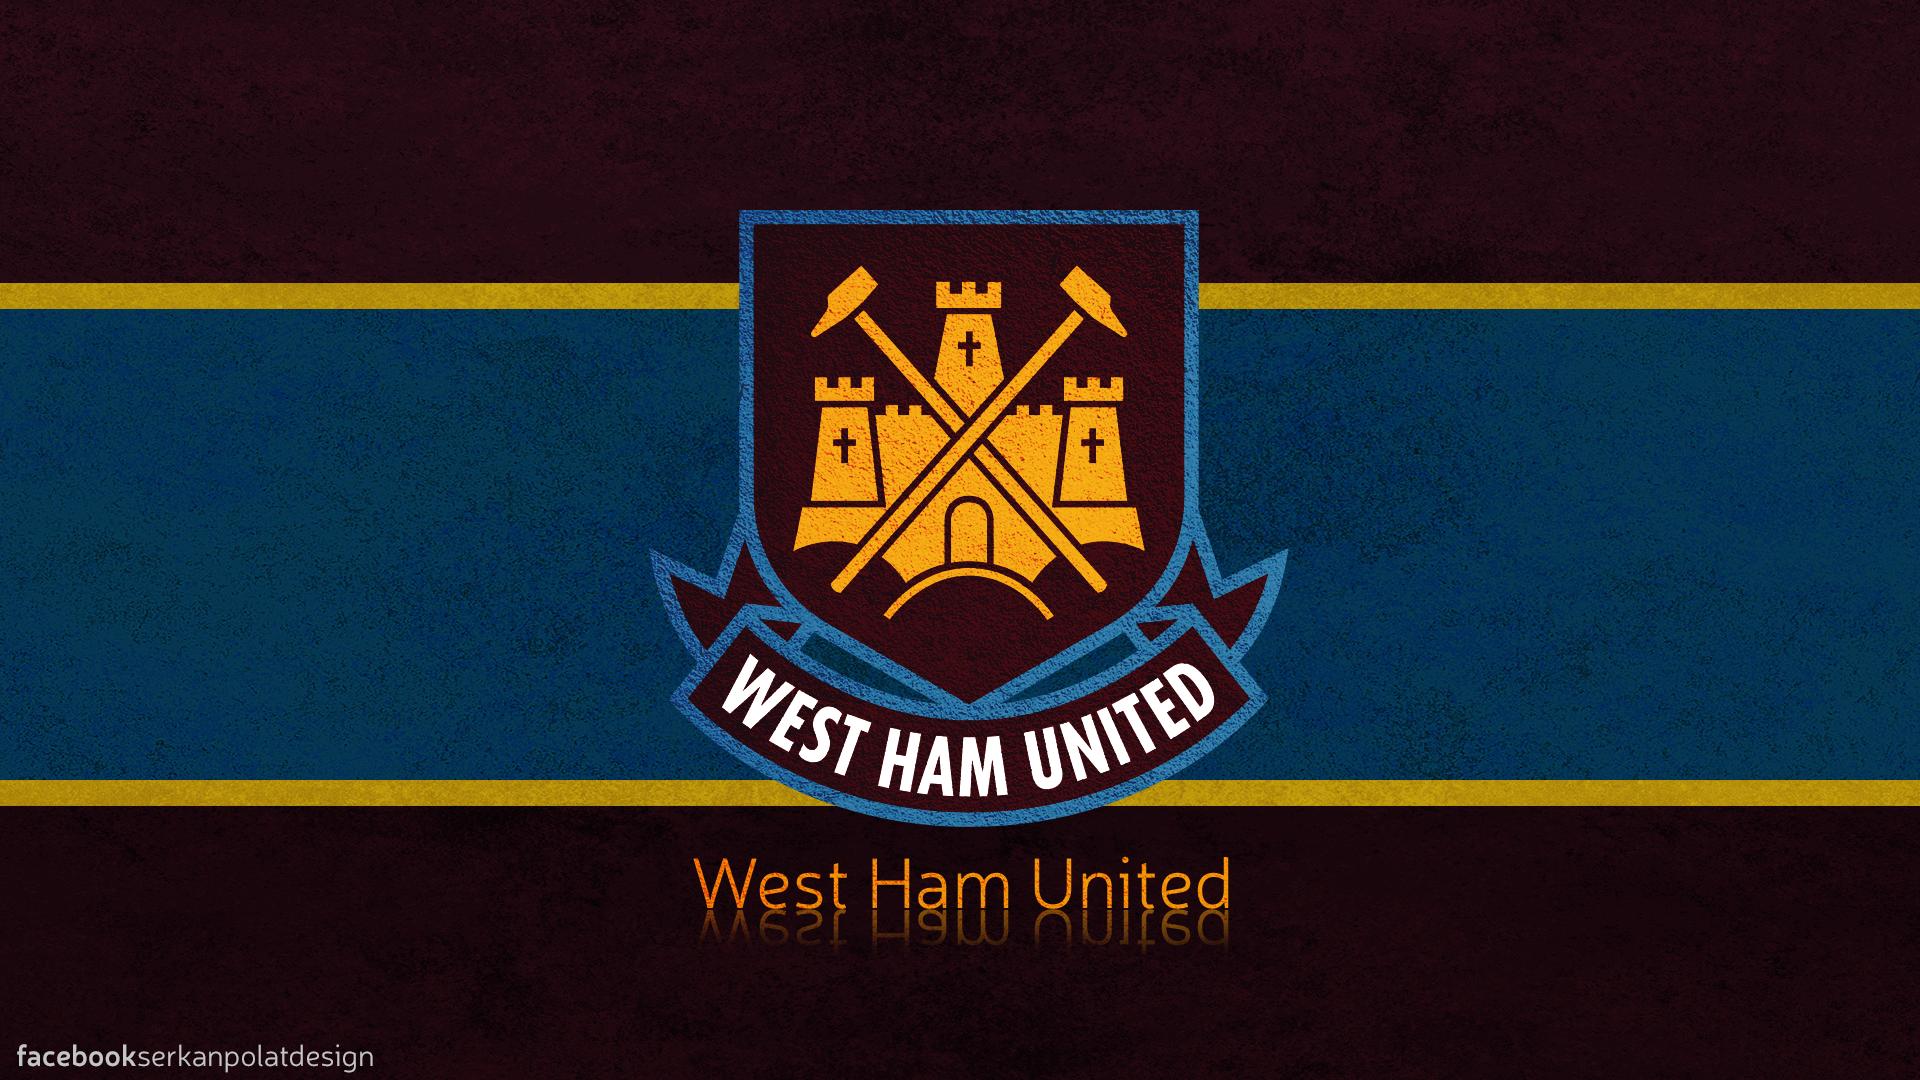 West Ham United FC HD Wallpaper Background Image 1920x1080 1920x1080